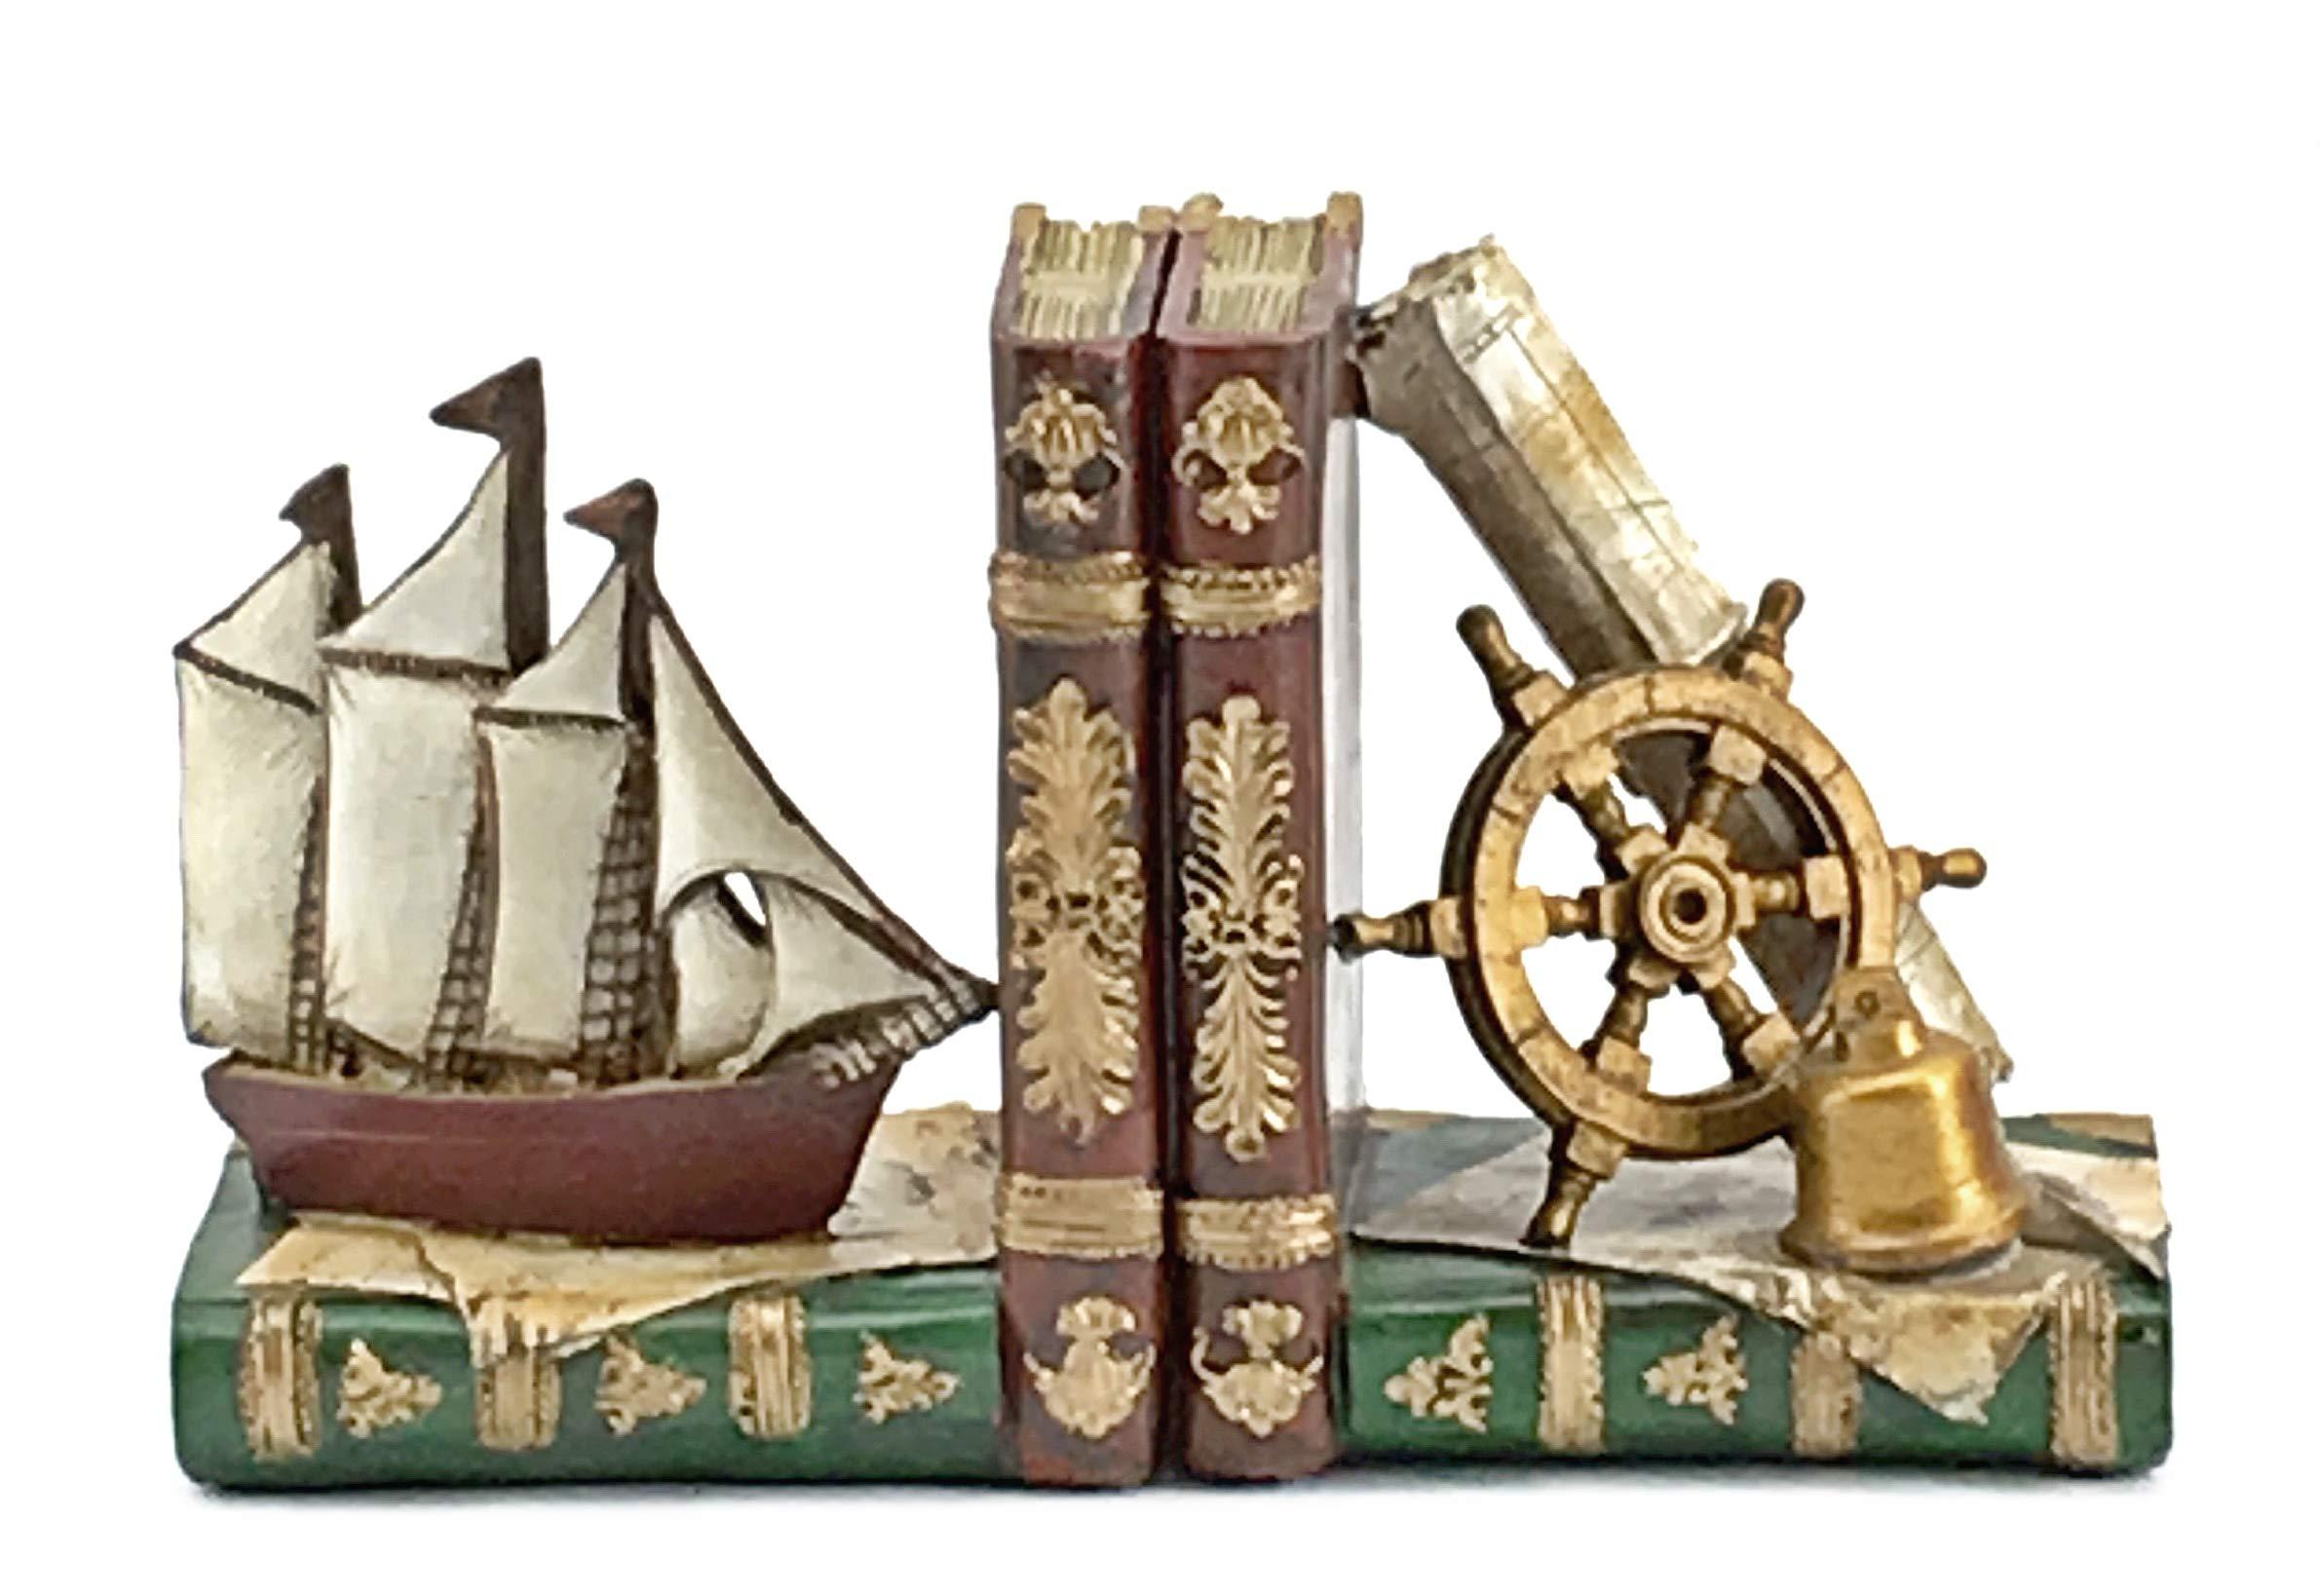 Bellaa 24247 Ship Bookends Nautical Pirate Sailboat Decor 6''